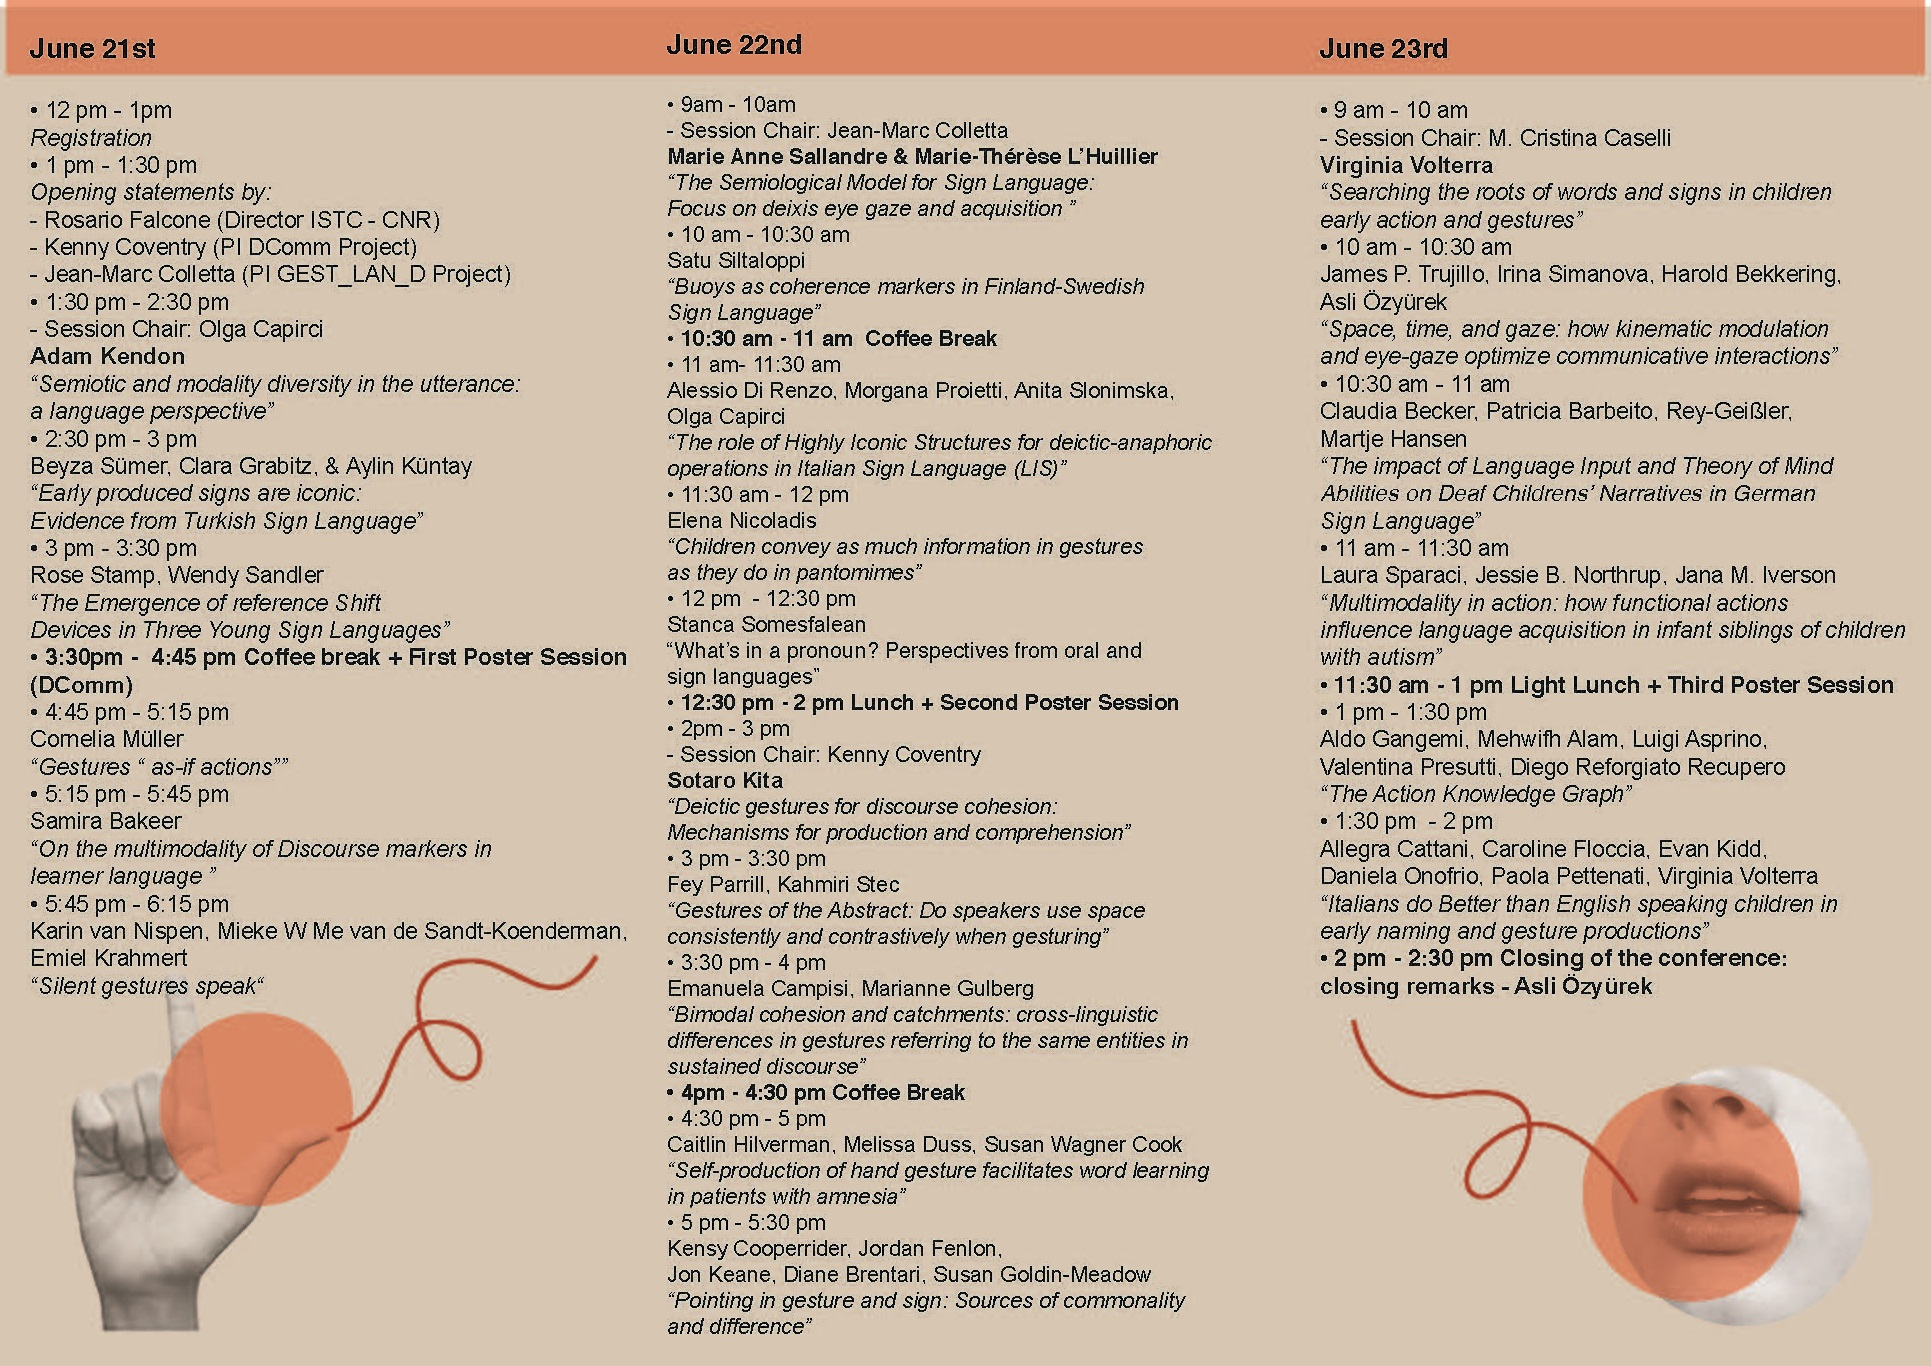 ISTC-CNR-Brochure-Conferenza-Language-as-a-form-of-action-ilovepdf-compressed_Pagina_2